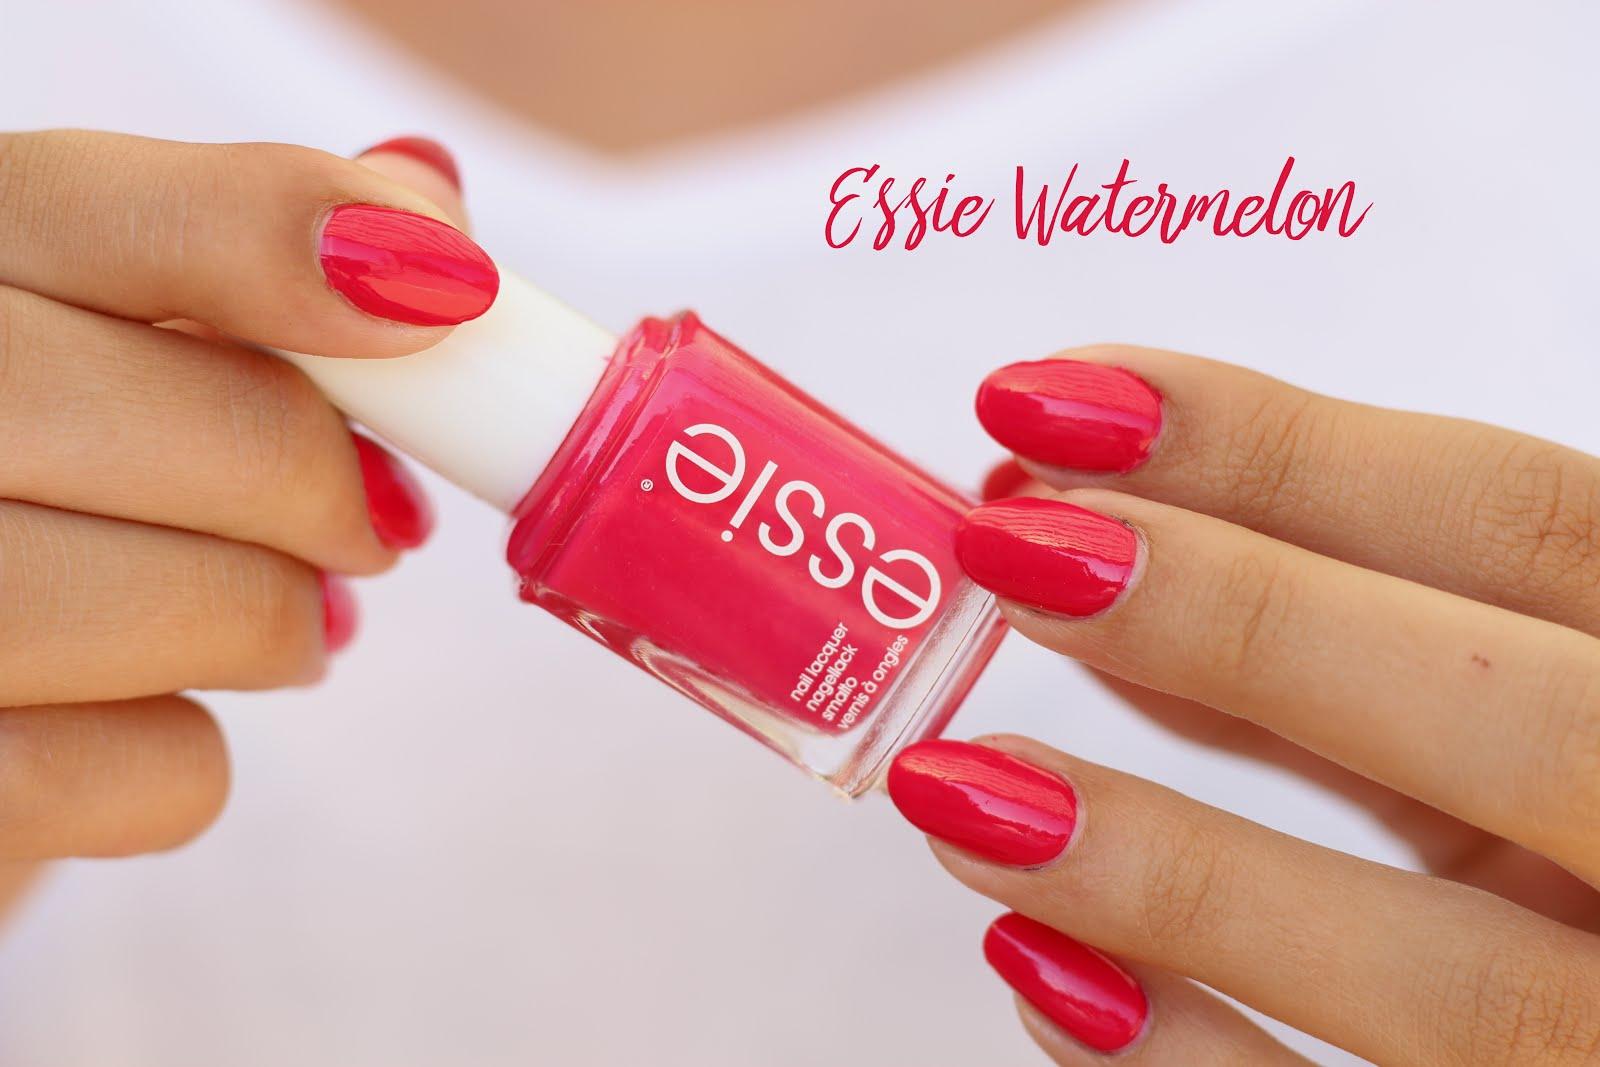 essie nailpolish, essie watermelon, essie nail polish watermelon, essie nail polish, watermelon